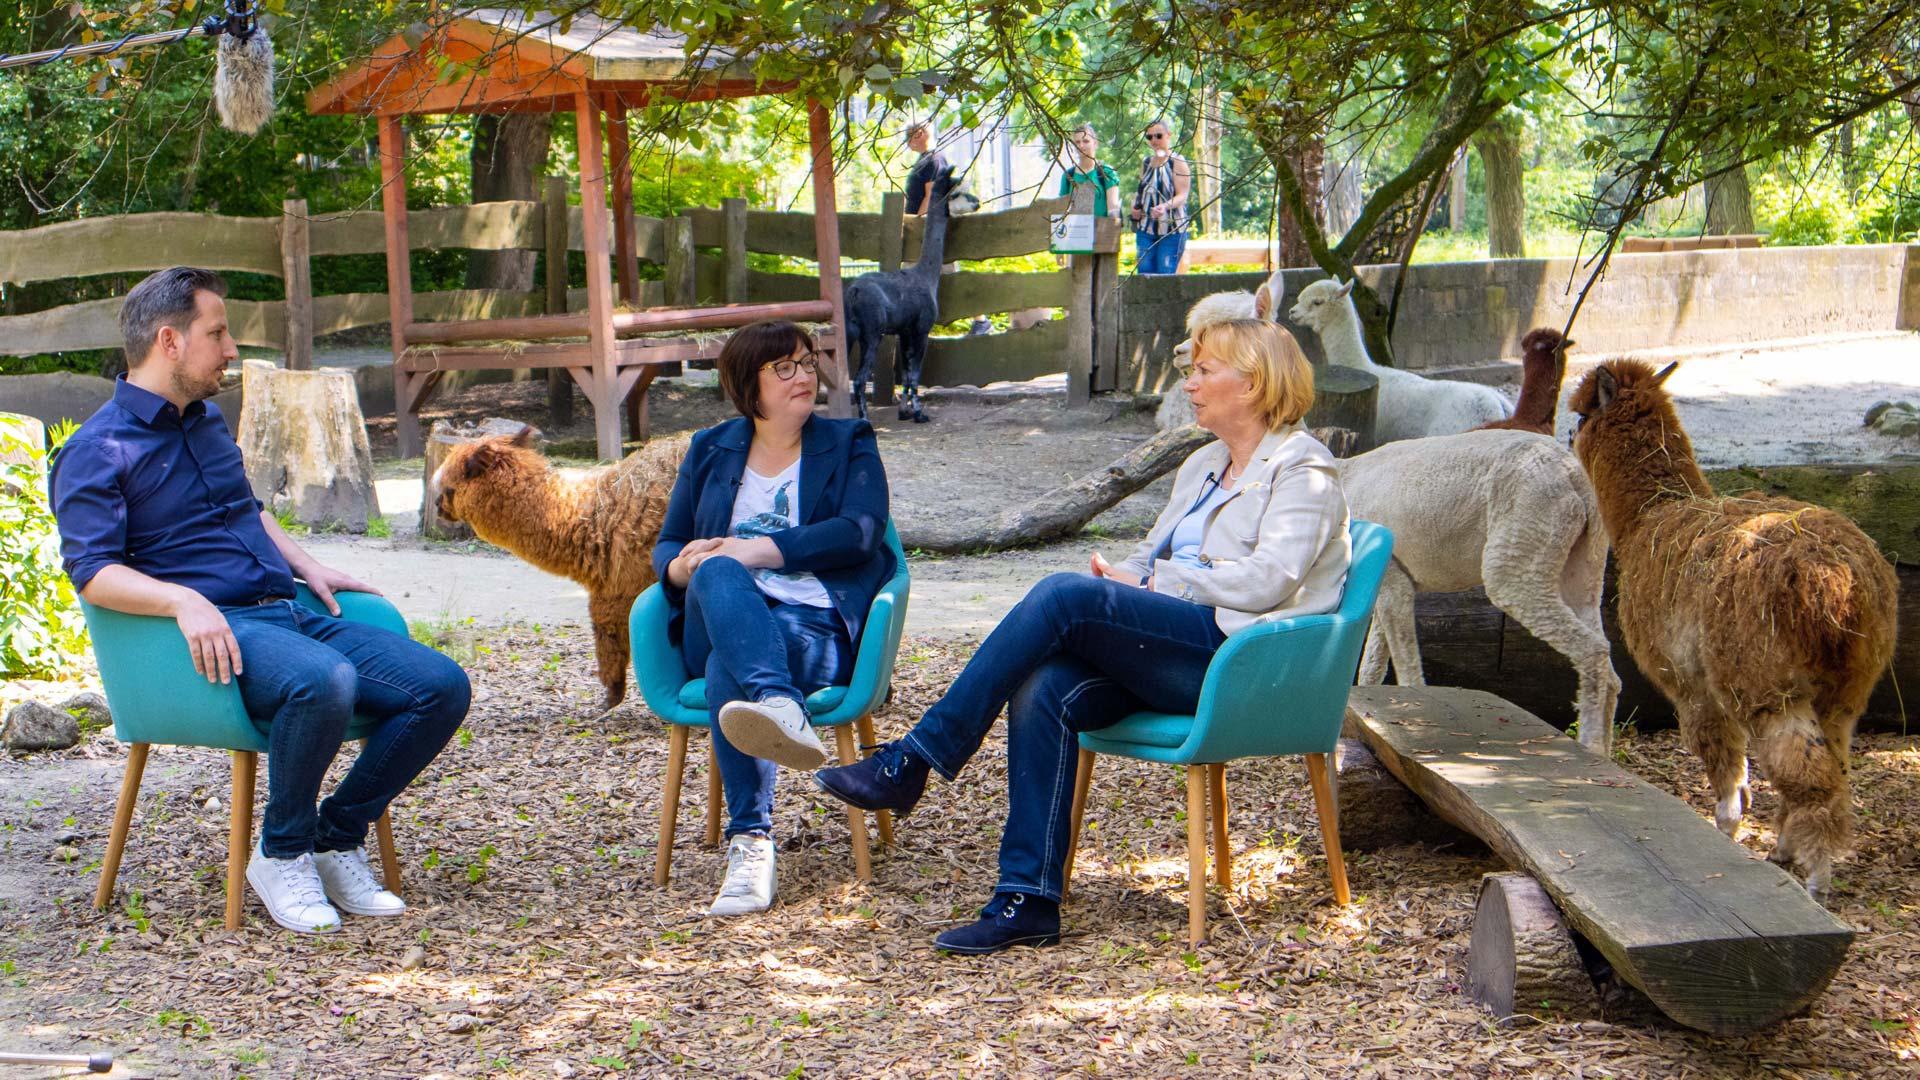 Videopodcast zur Umgestaltung des Tierparks